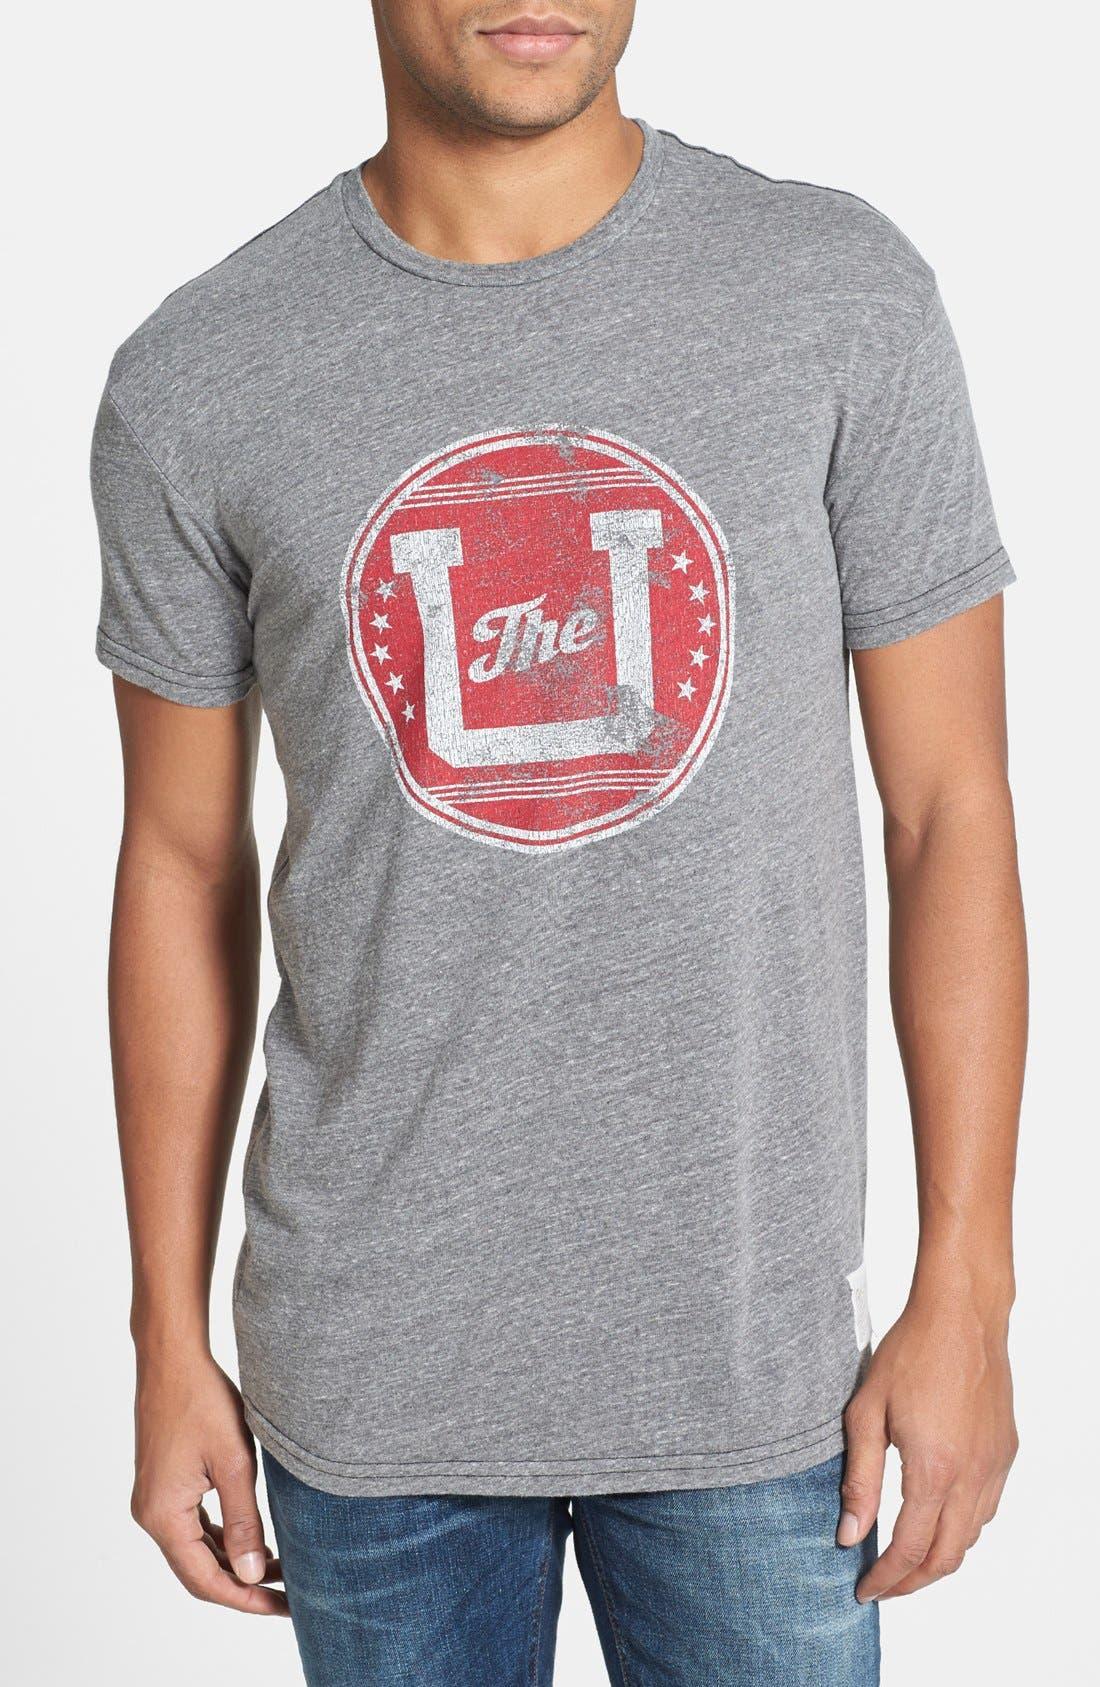 Alternate Image 1 Selected - Retro Brand 'The U - University of Utah' Graphic T-Shirt